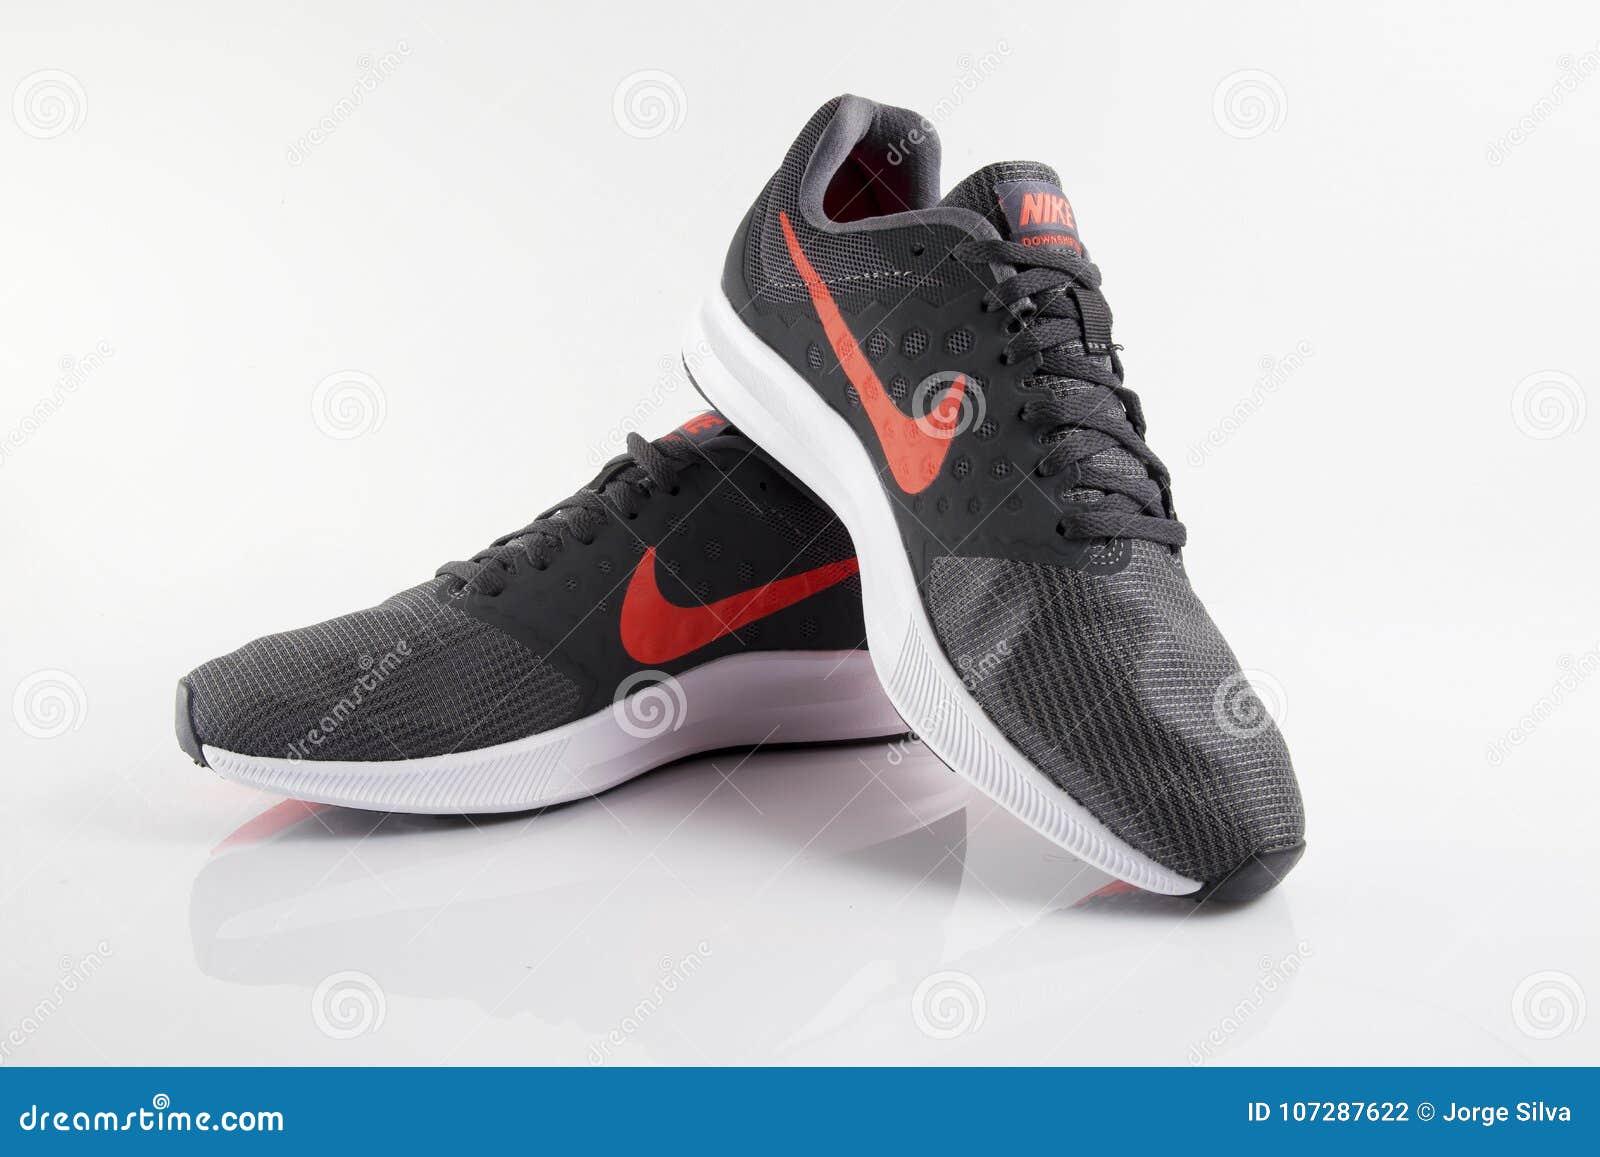 taille 40 90280 809c4 Espadrille Nike Trail photographie éditorial. Image du ...